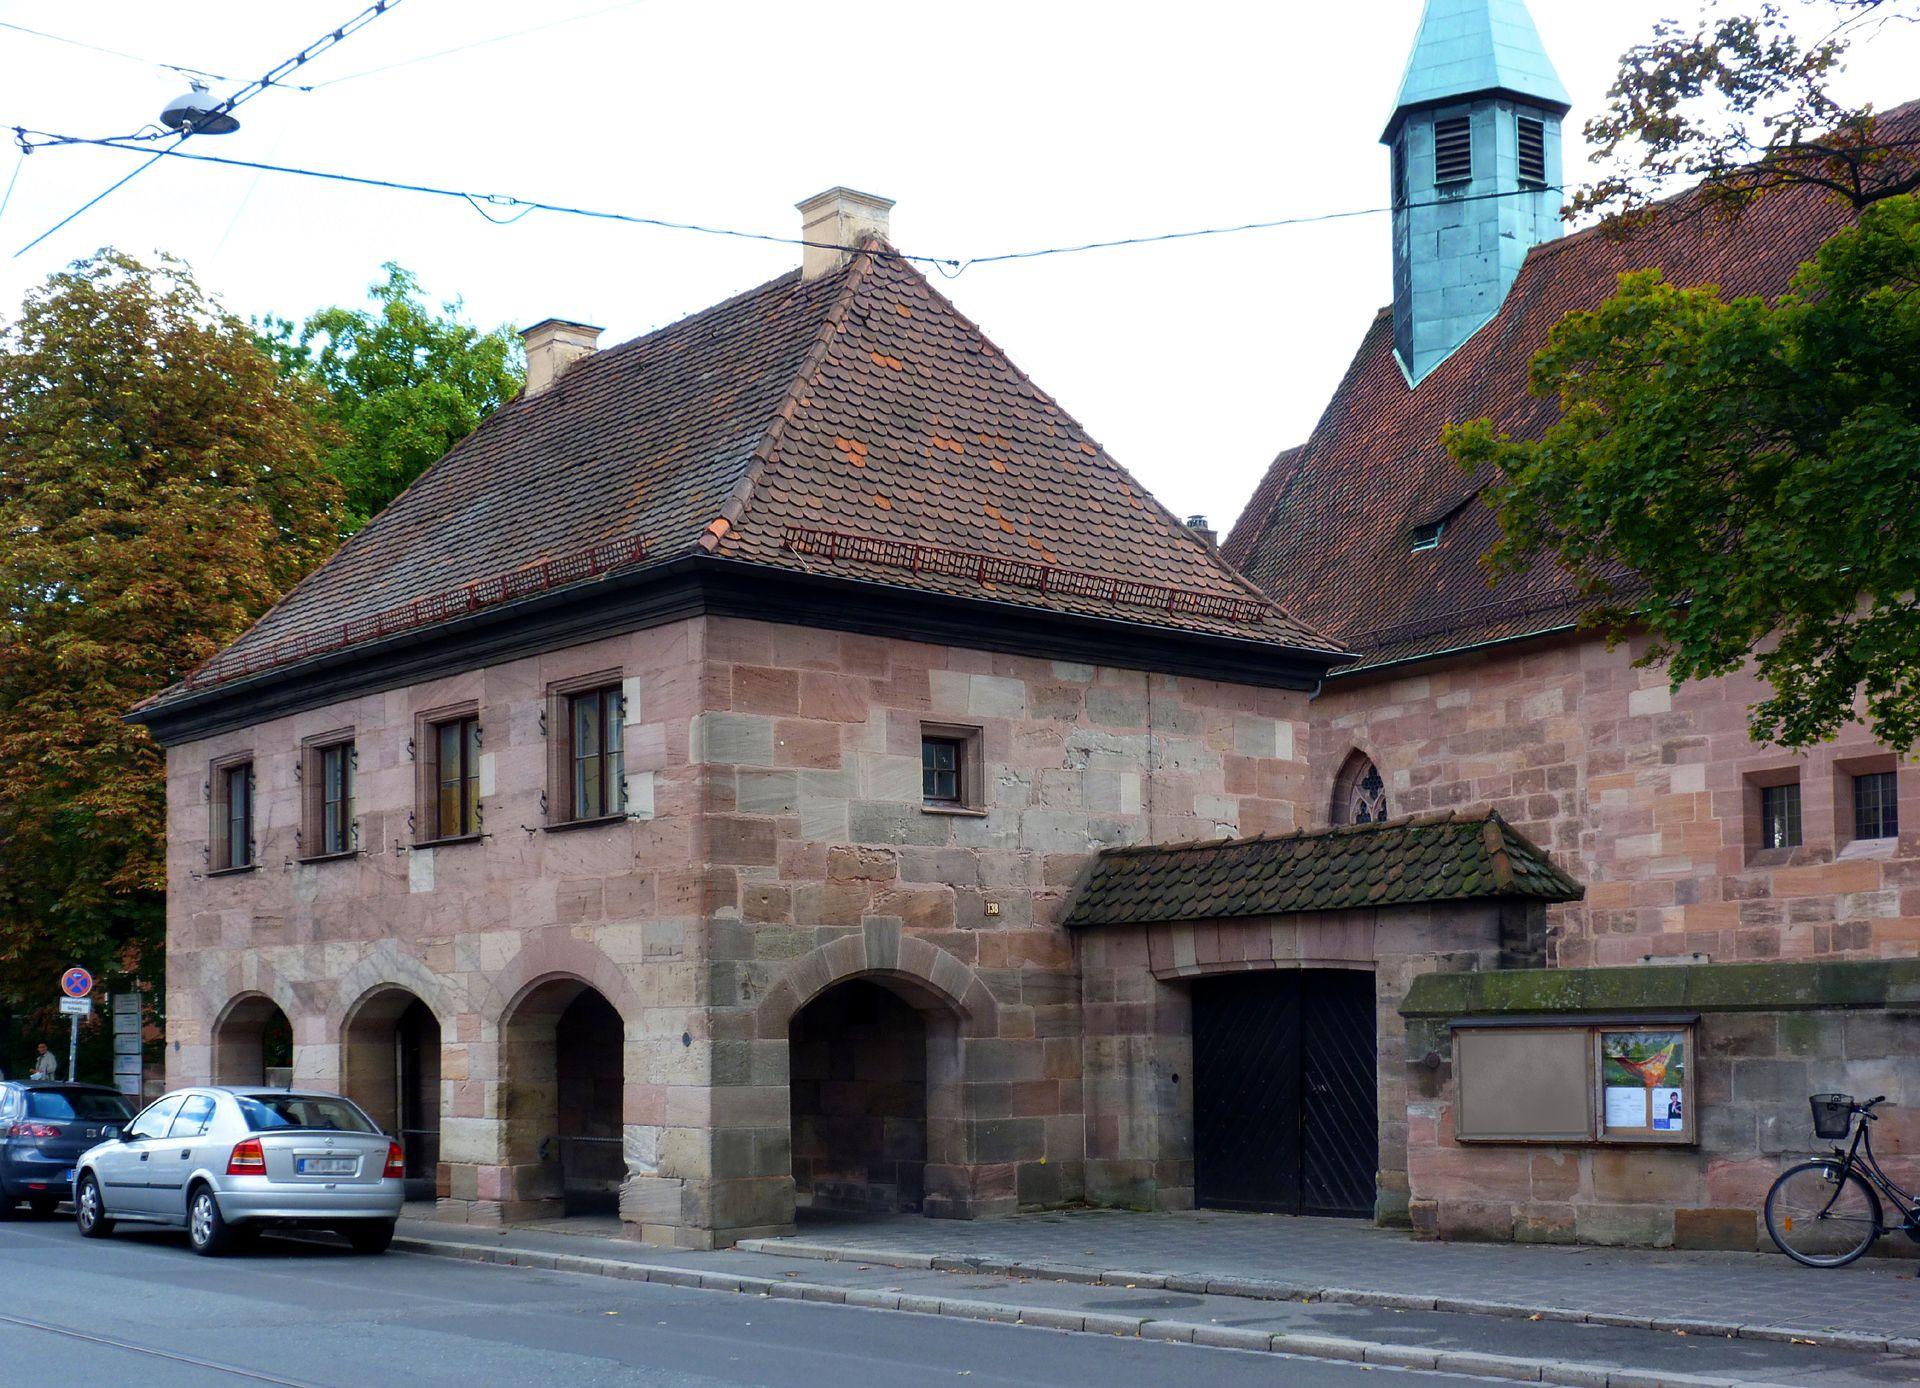 St.Jobst Pförtnerhaus, Fritz Mayer, 1938